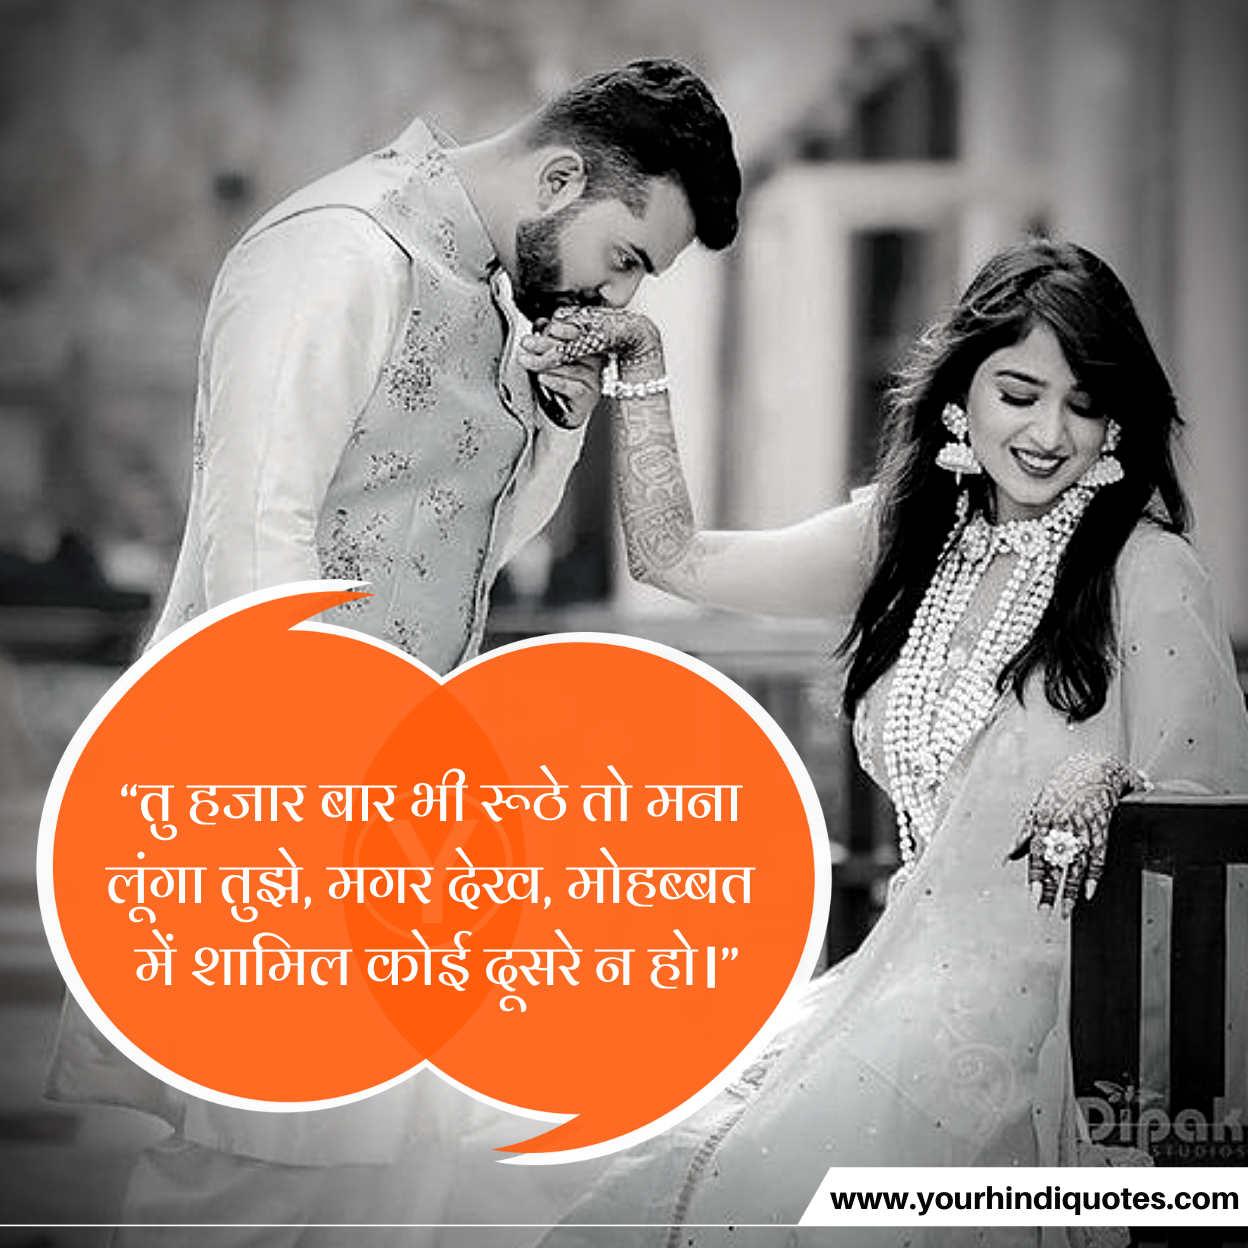 Hindi Good Morning Shayari Pictures